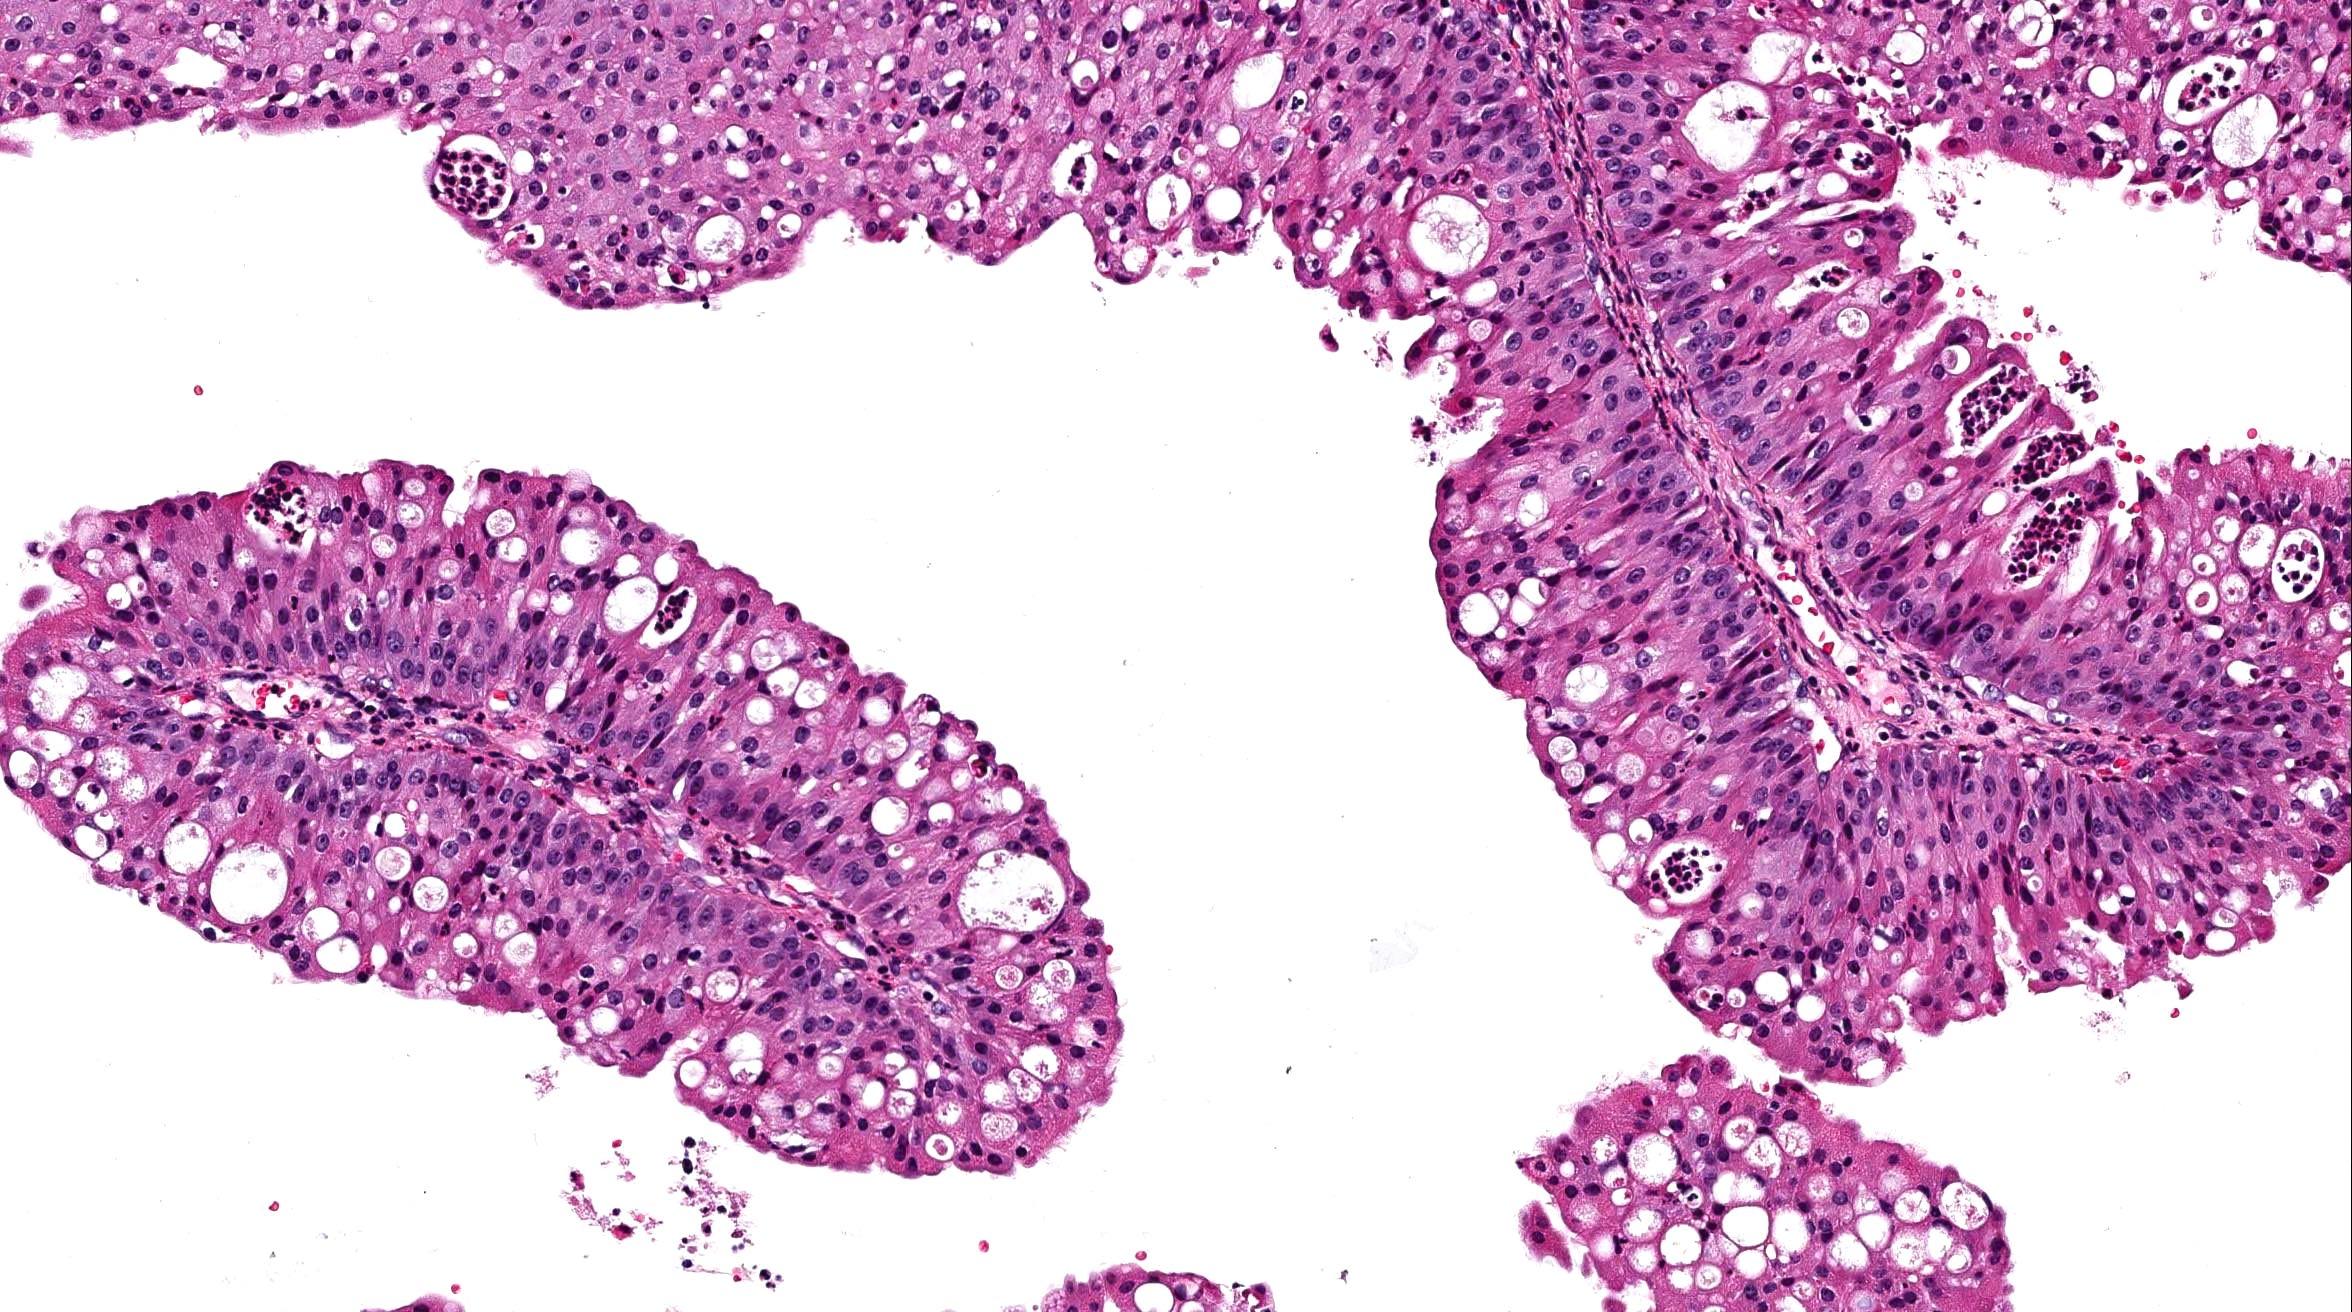 sinonasal papilloma pathology outlines cancer renal hereditario